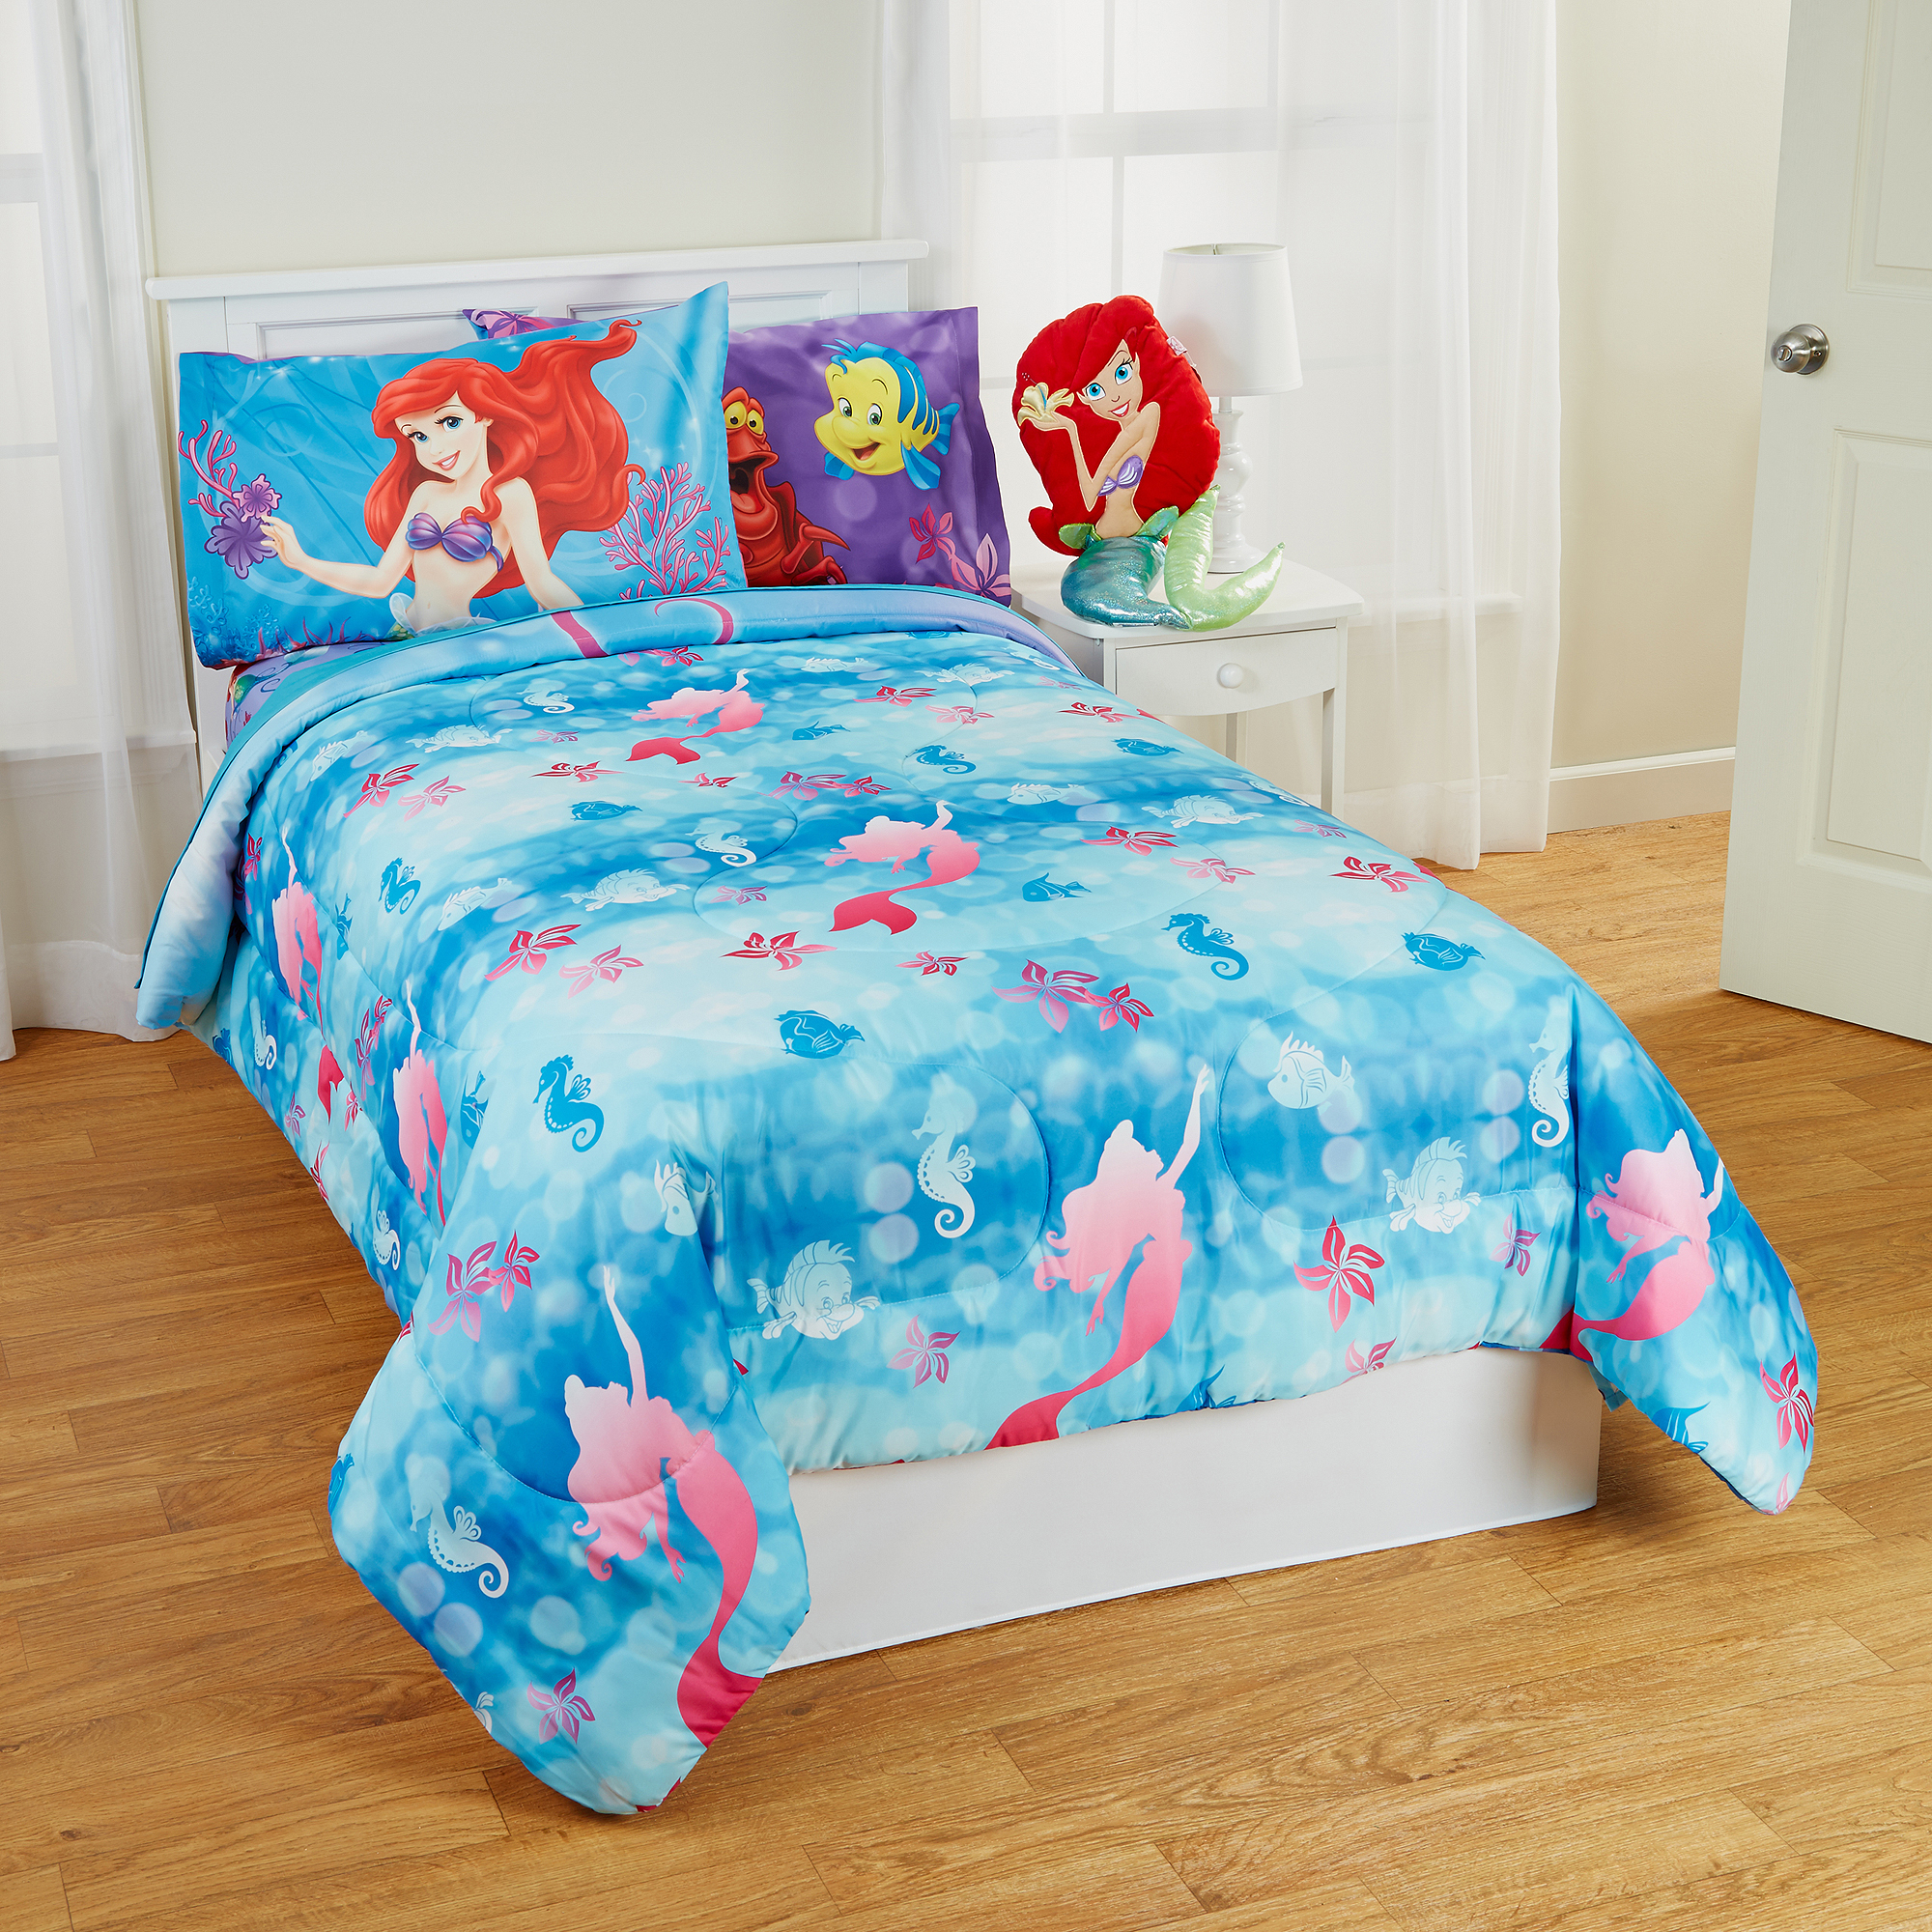 Little Mermaid Comforter